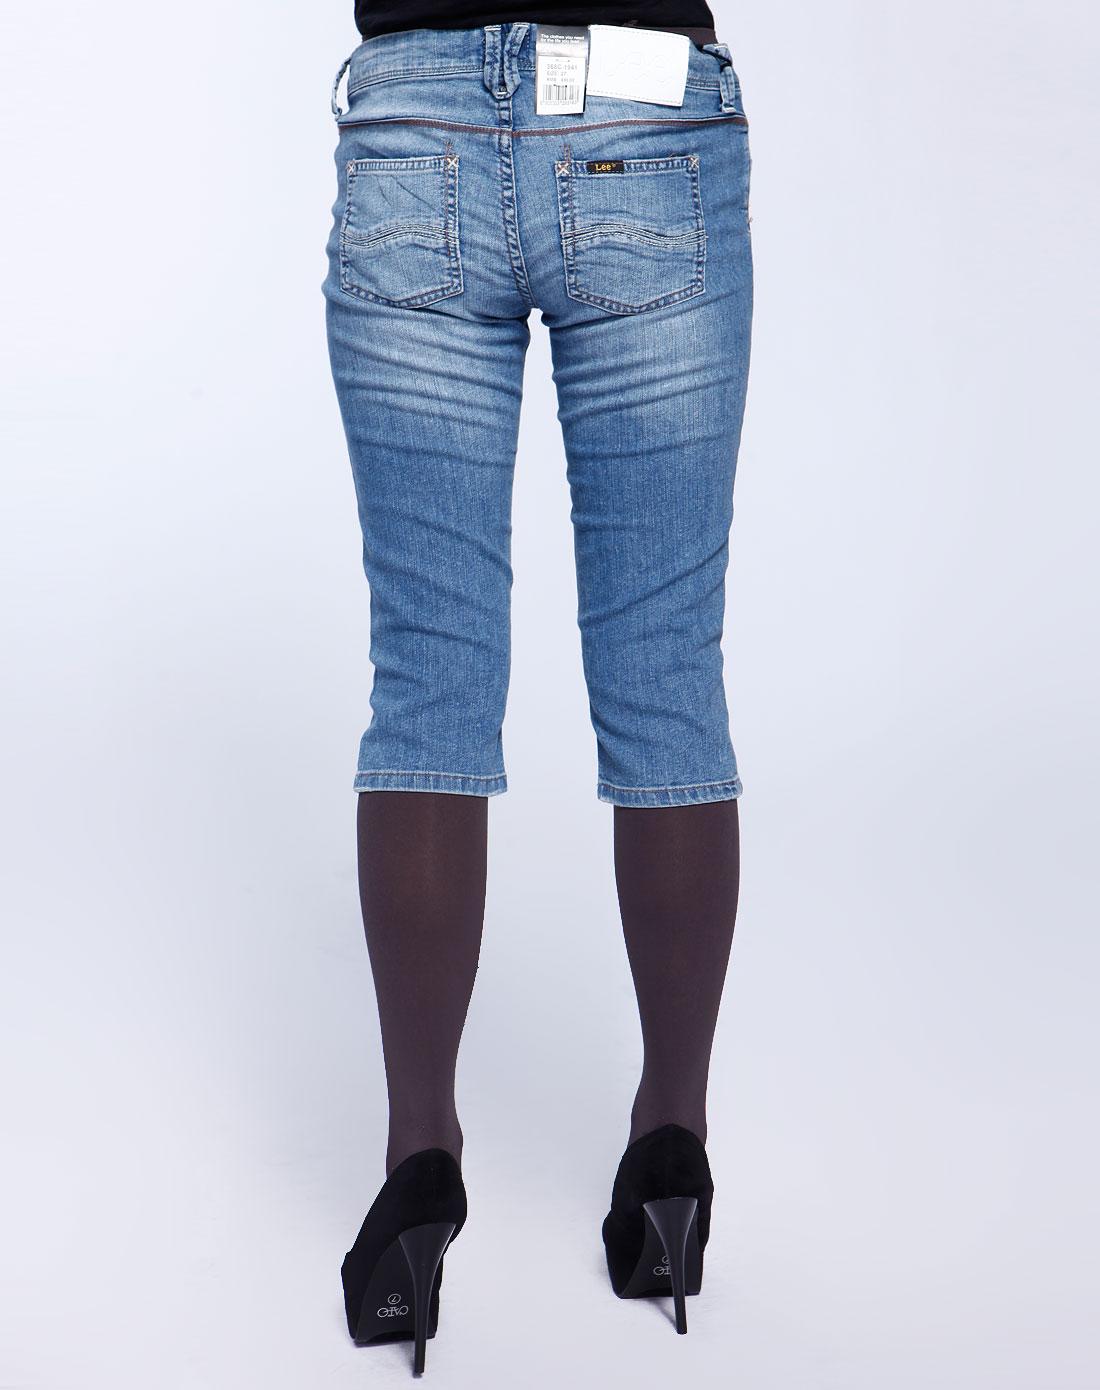 lee女款蓝色低腰五分牛仔裤